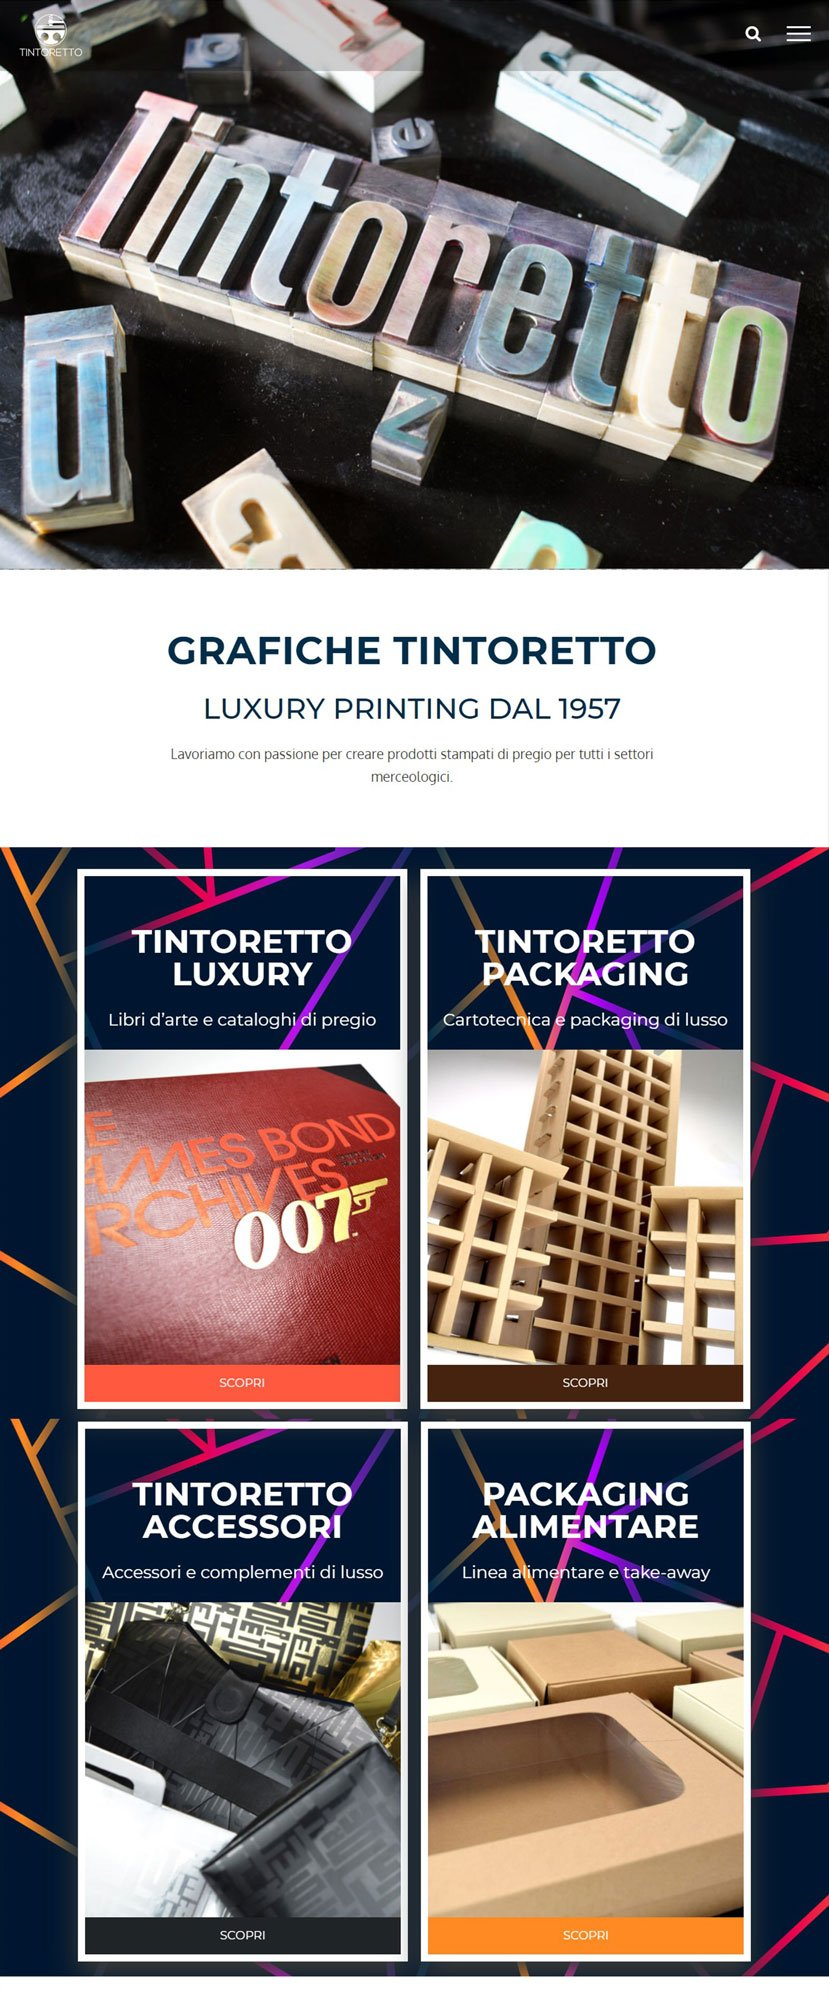 TINTORETTO-WEBSITE-SCROLL